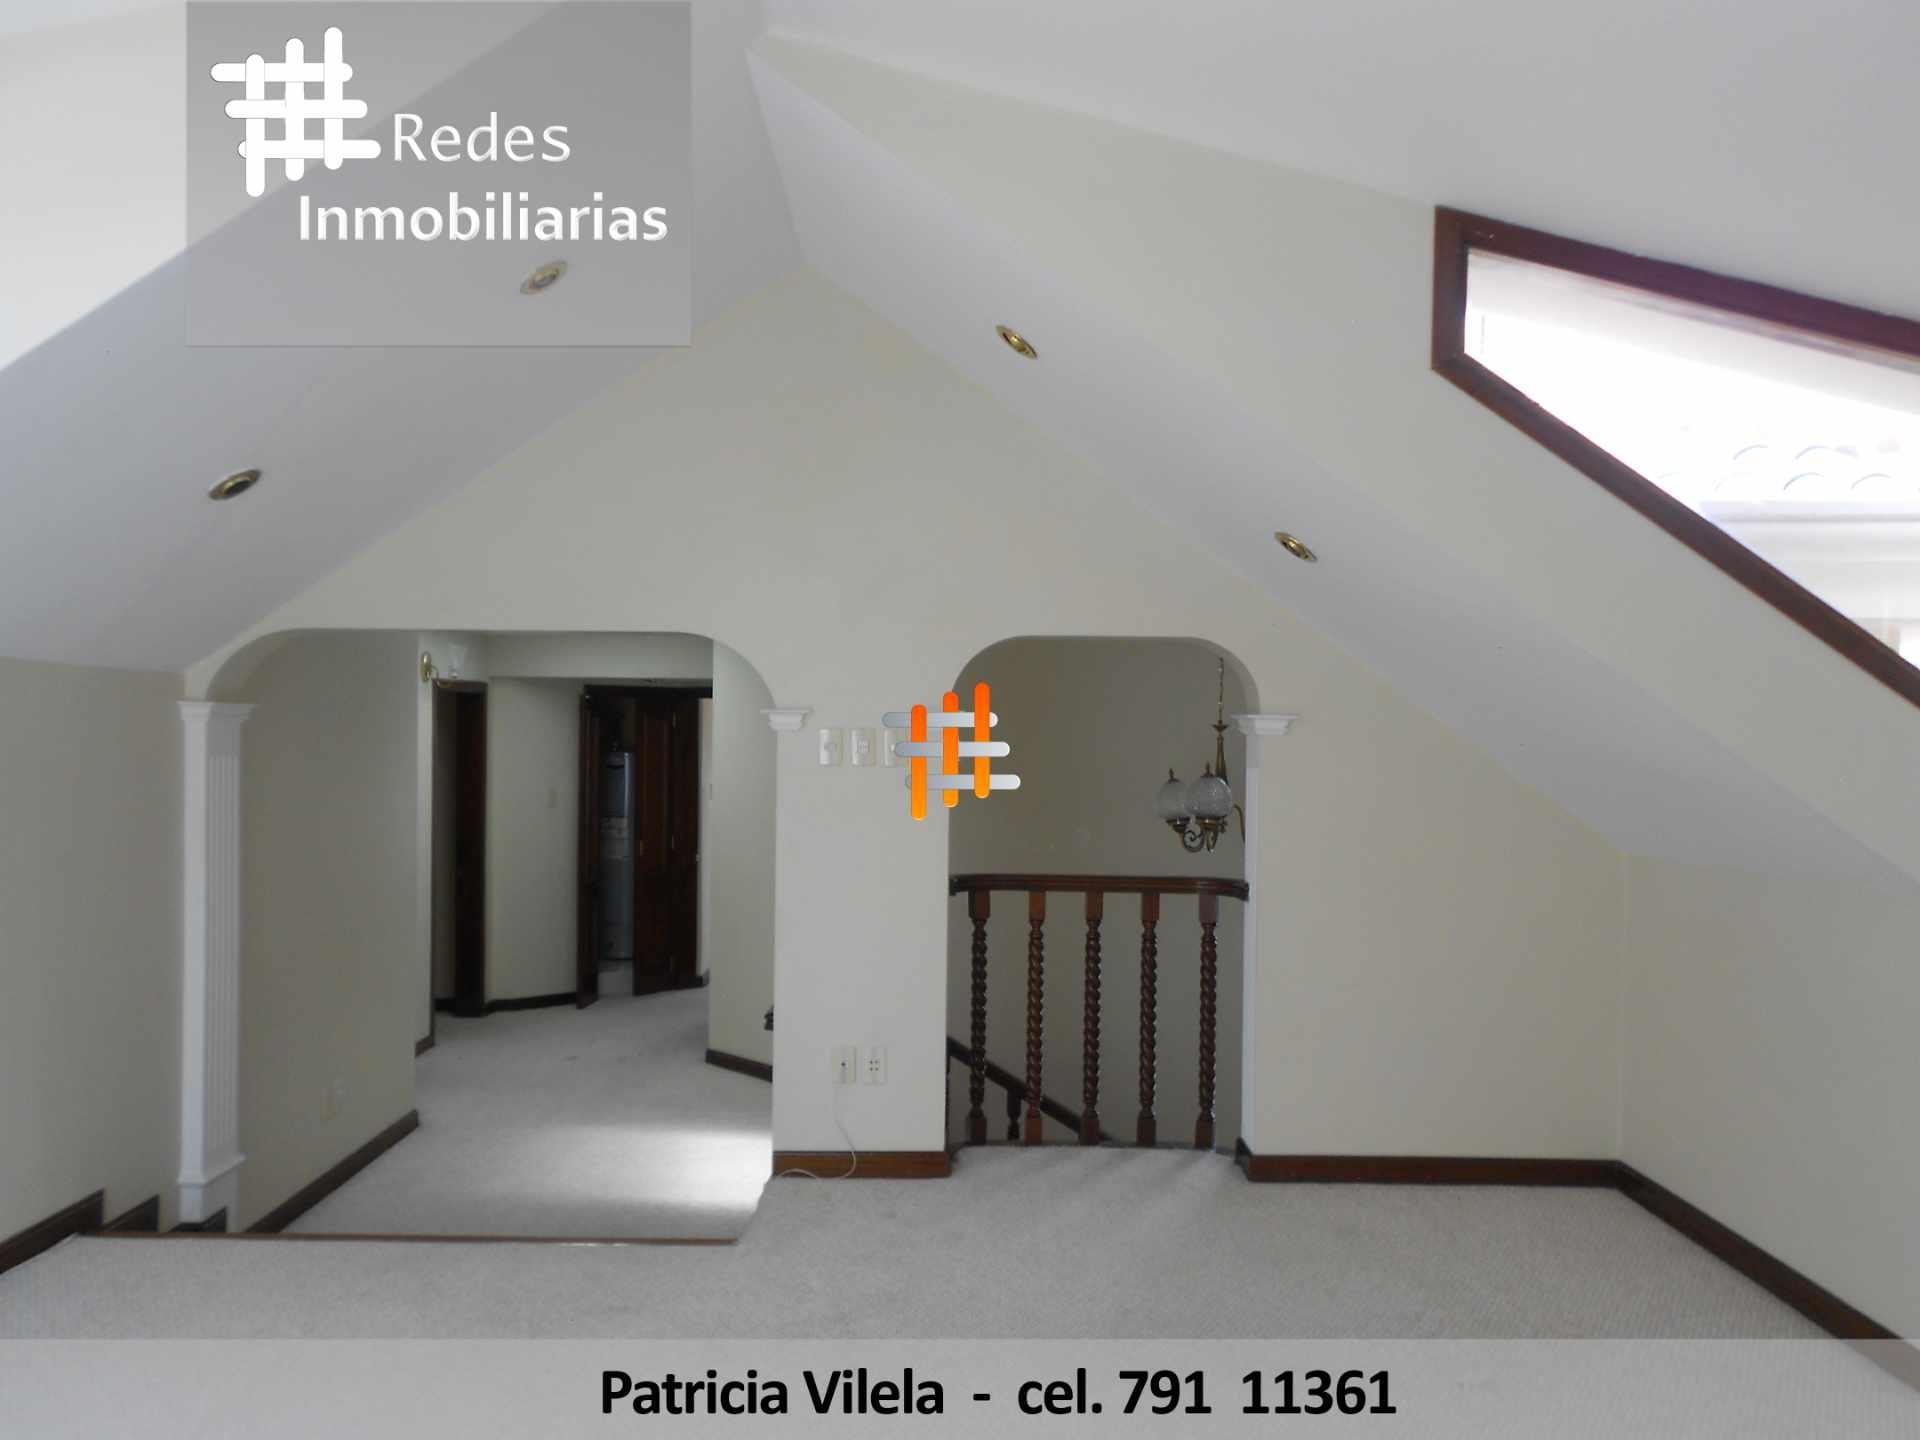 Casa en Alquiler HERMOSA RESIDENCIA EN ALQUILER  ...ARANJUEZ Foto 21